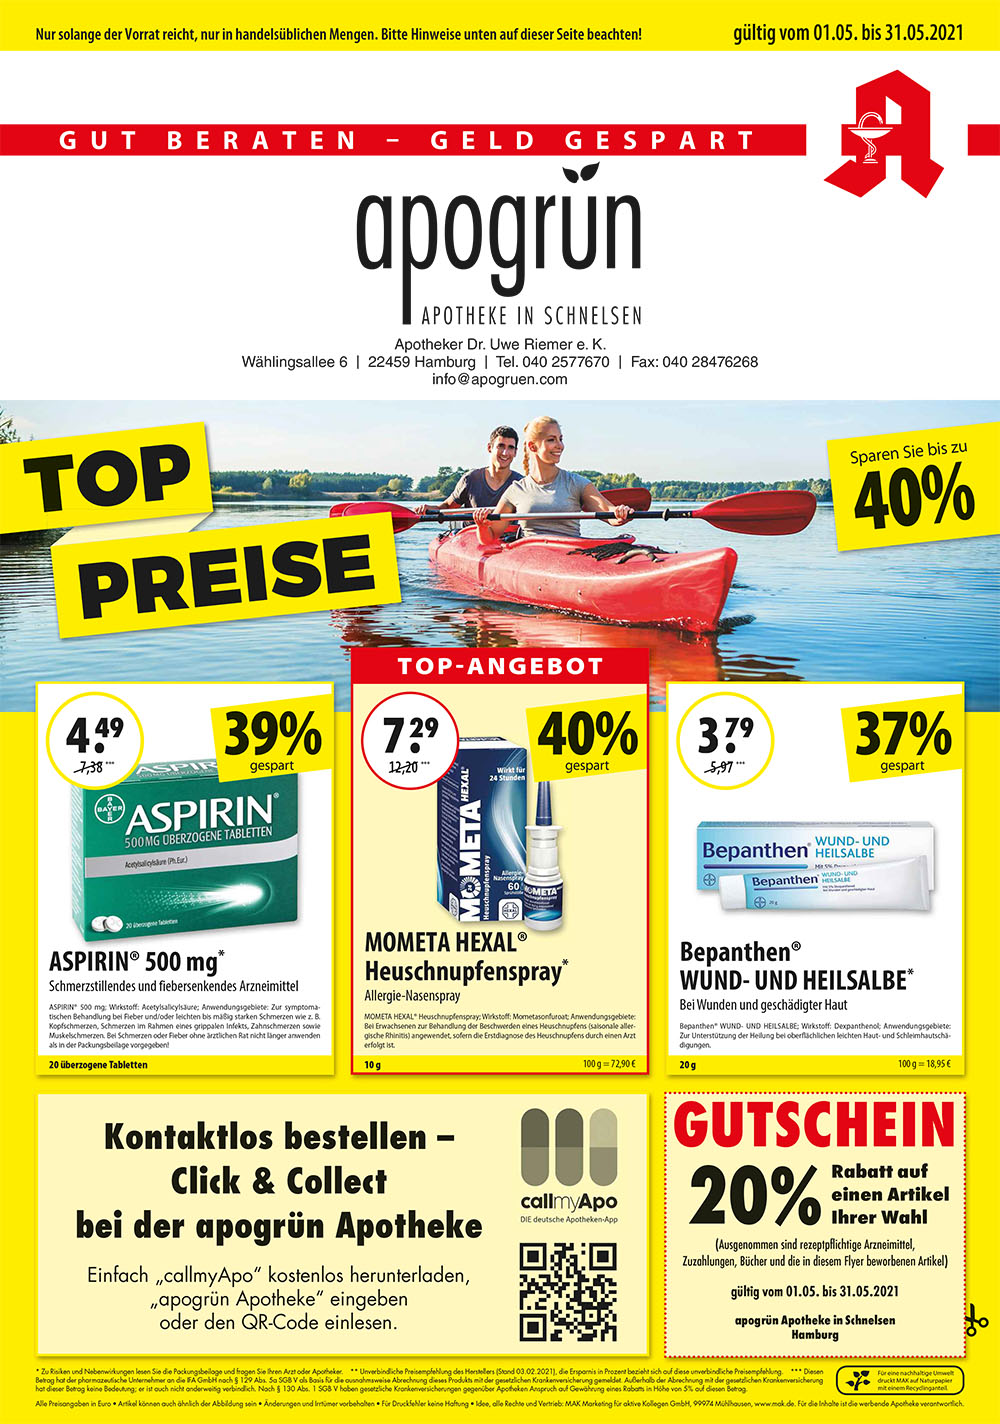 http://www.apotheken.de/fileadmin/clubarea/00000-Angebote/22459_gruen_angebot_1.jpg